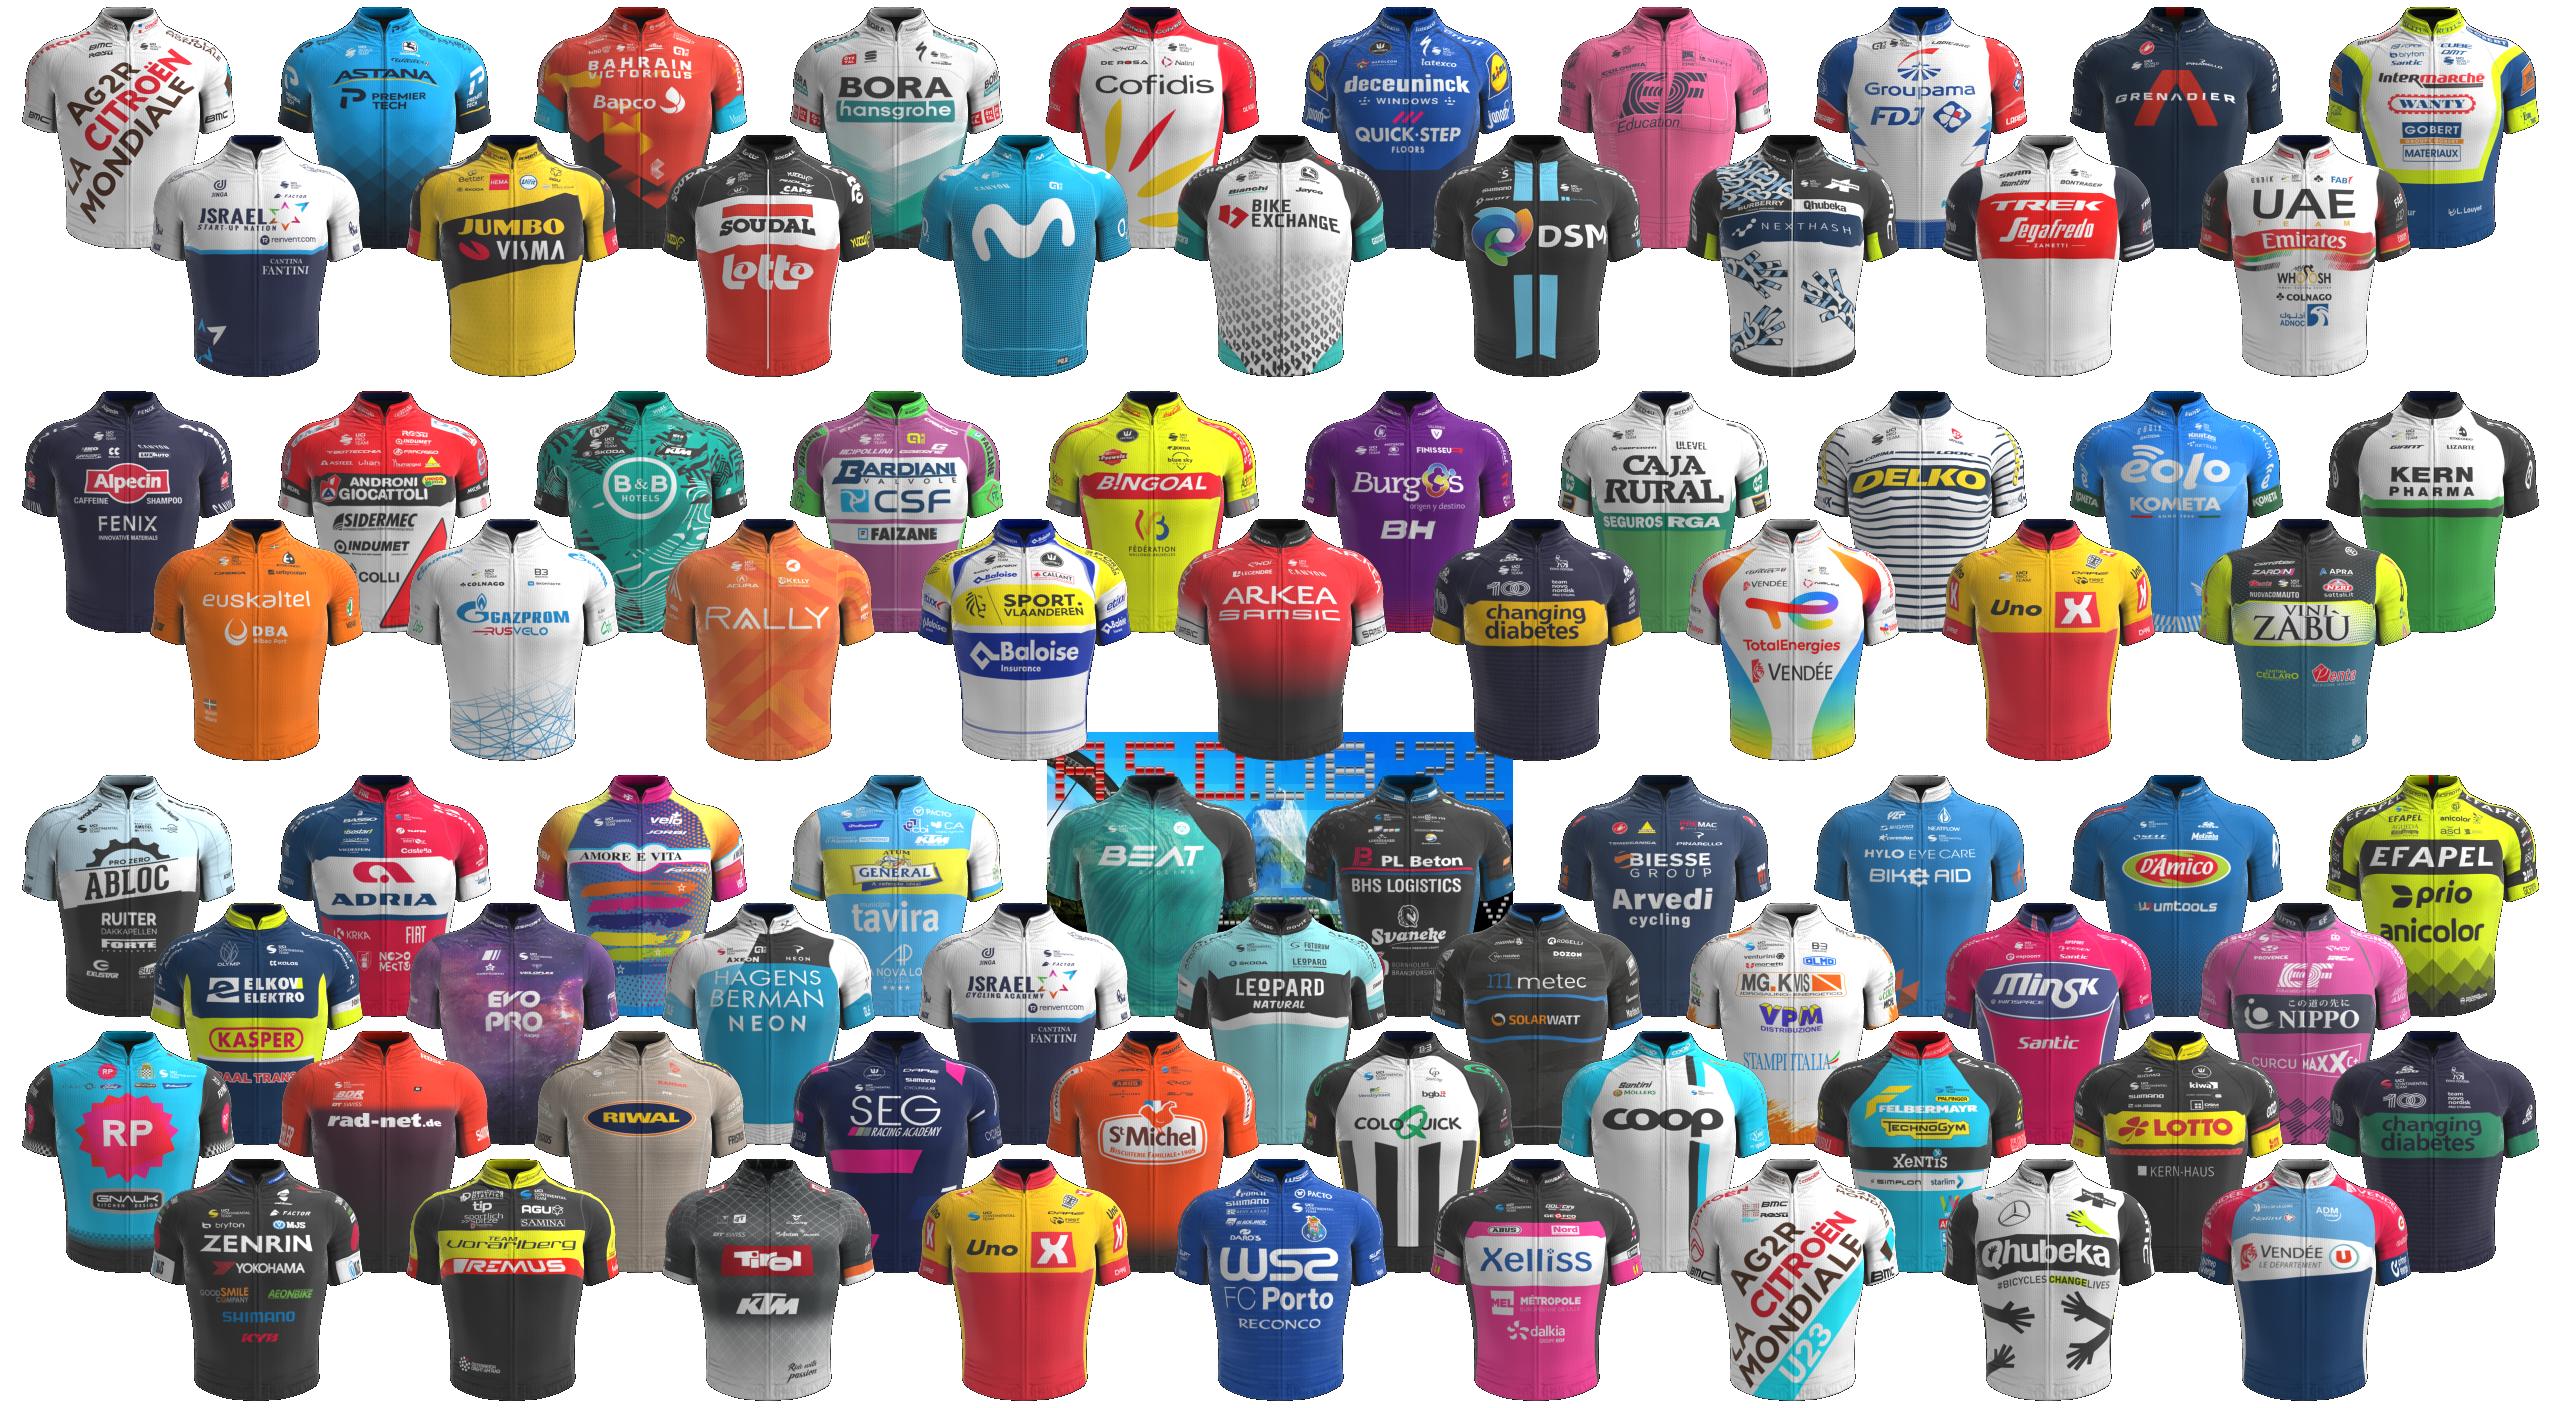 pcmdaily.com/images/mg/2015/Races/CT/GPYekaterinburg/asodb2021013.png